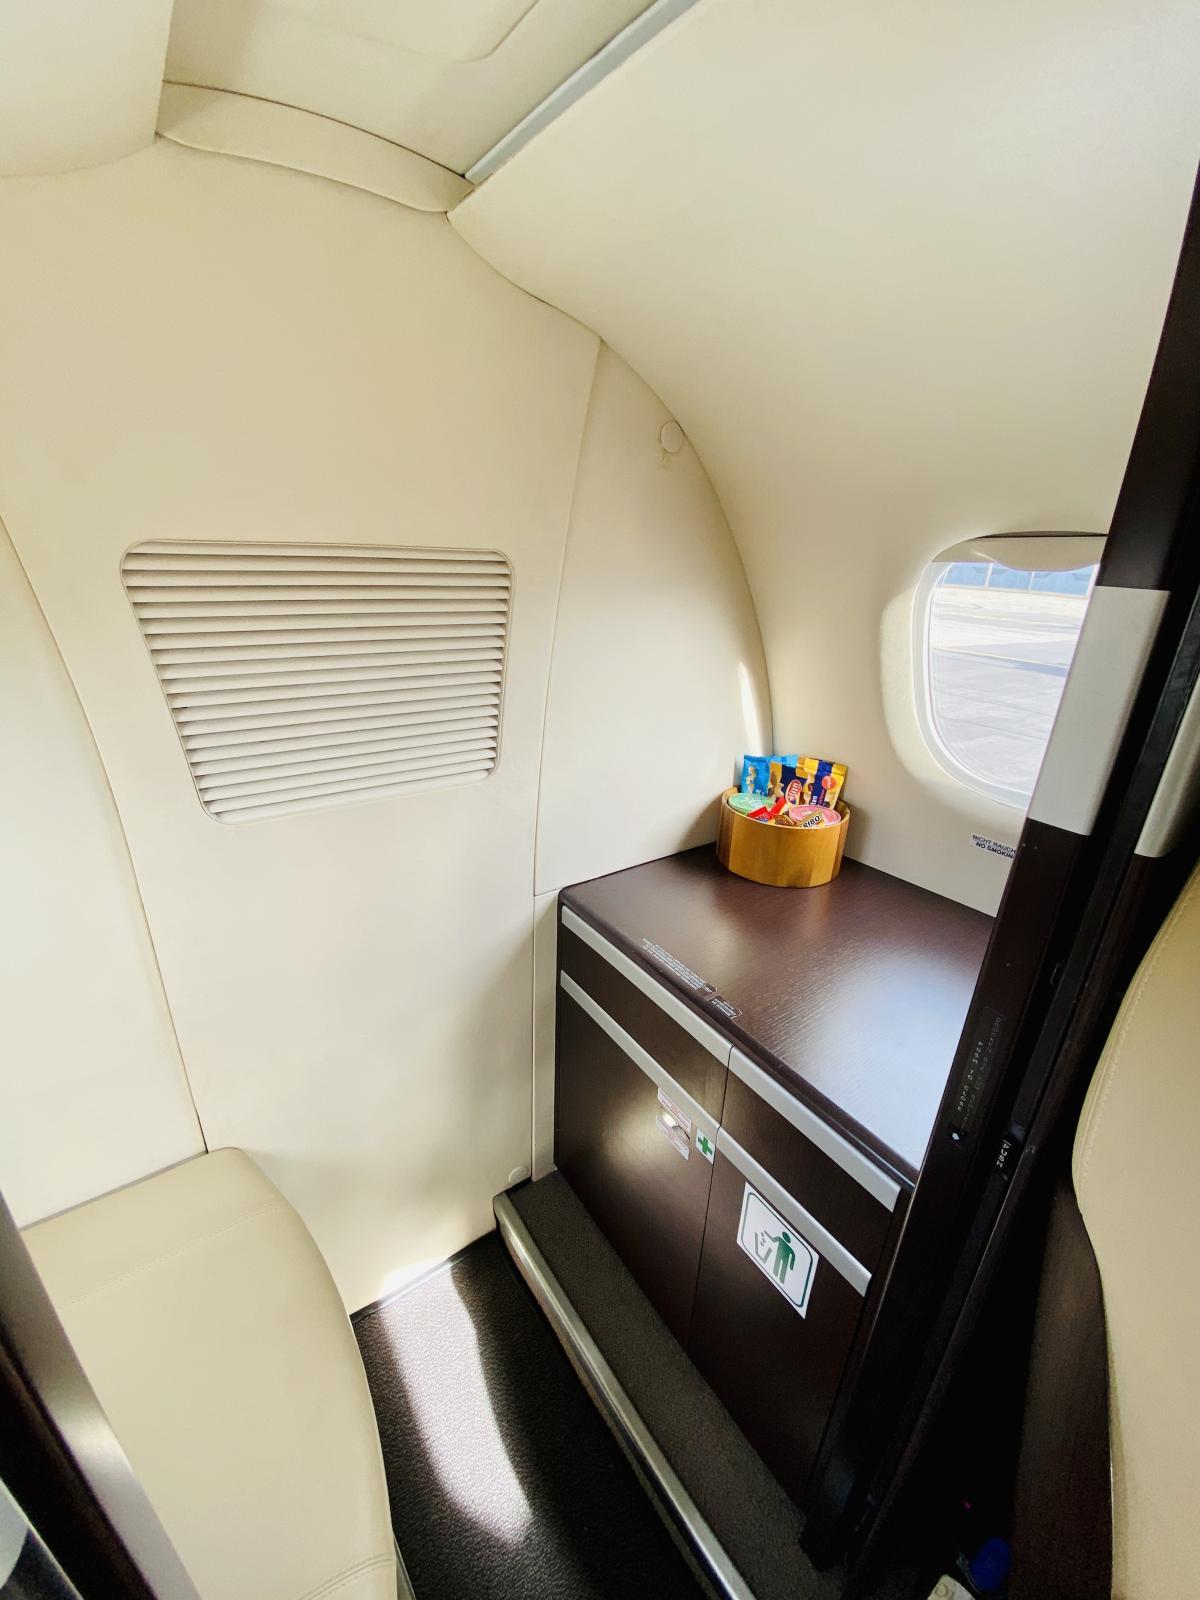 2011 Embraer Phenom 100 Photo 6